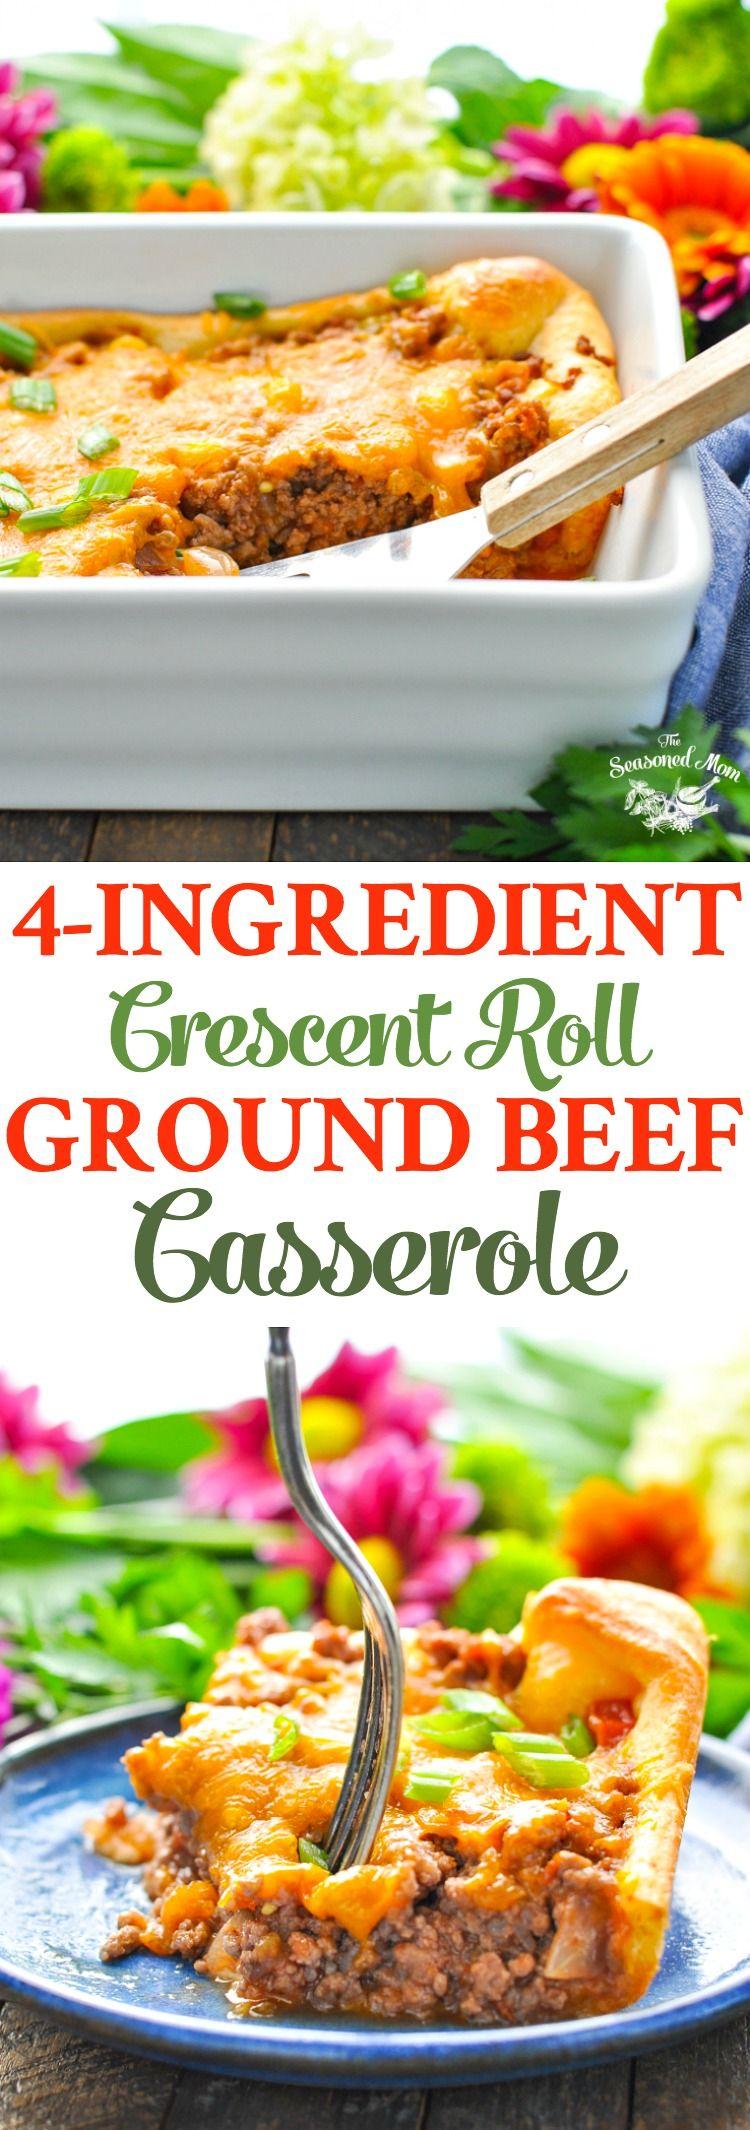 4 Ingredient Ground Beef Casserole Recipe Beef Casserole Recipes Ground Beef Casserole Recipes Easy Casserole Recipes